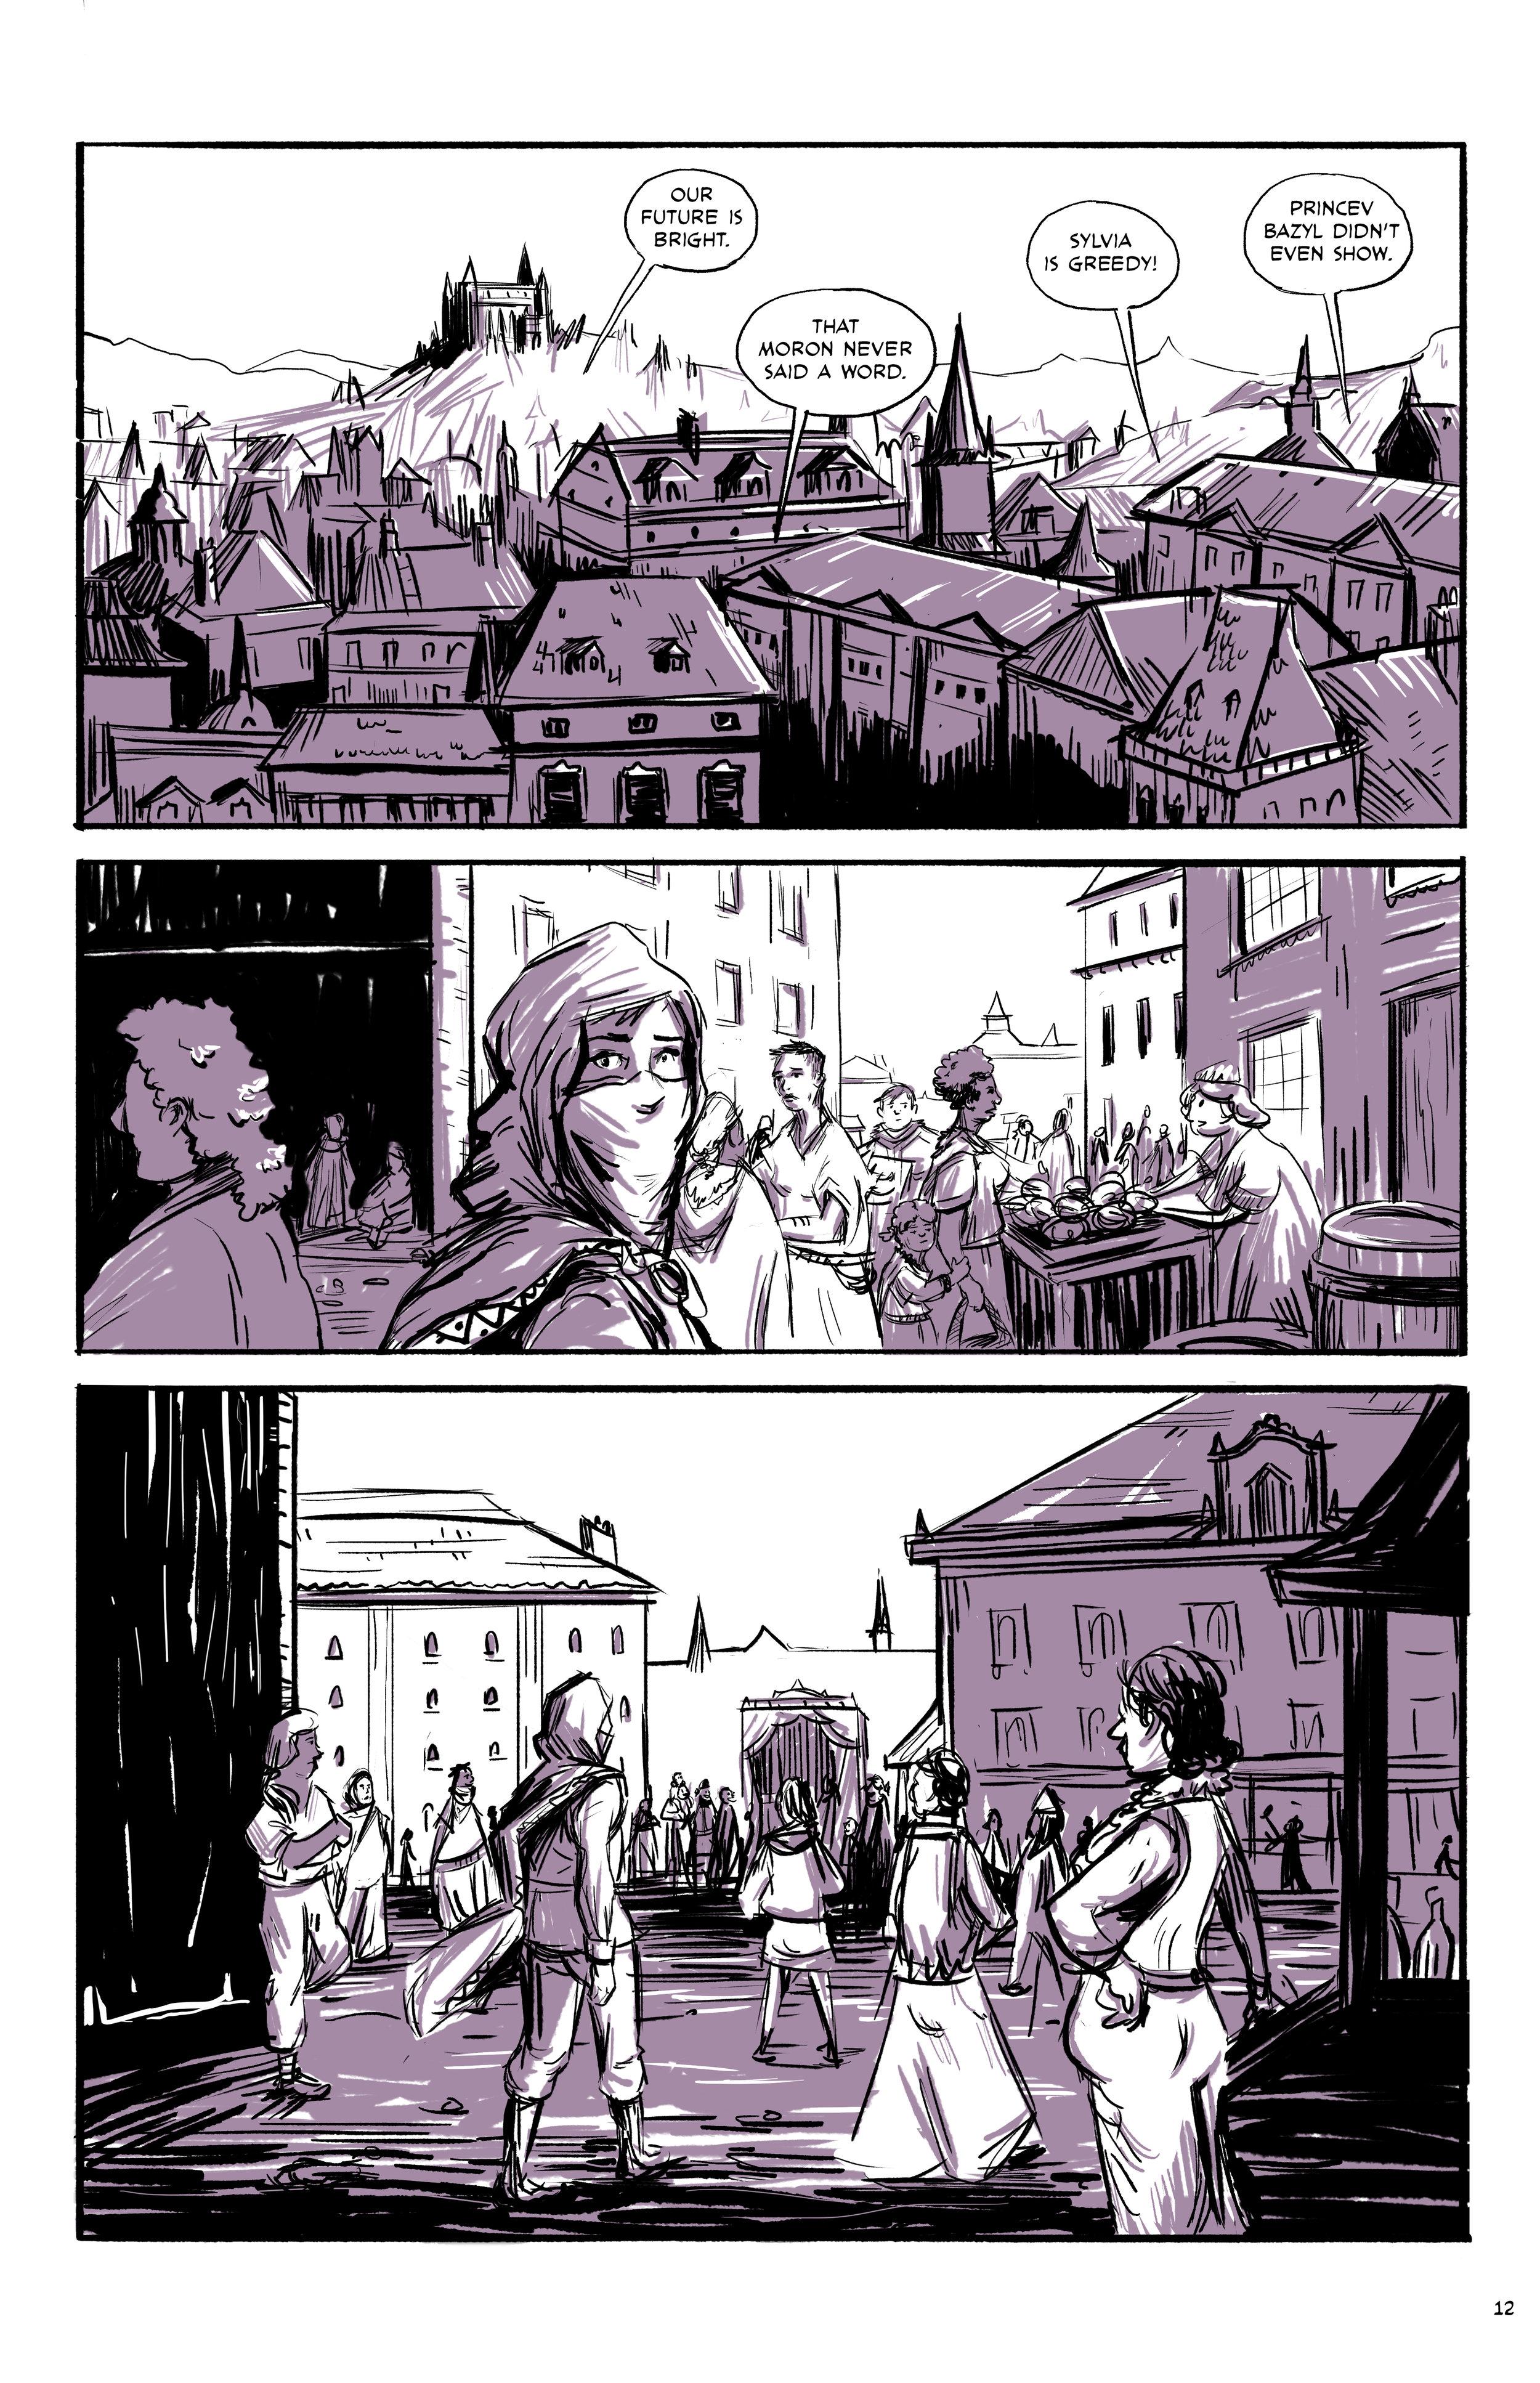 pg 12 dialogue.jpg